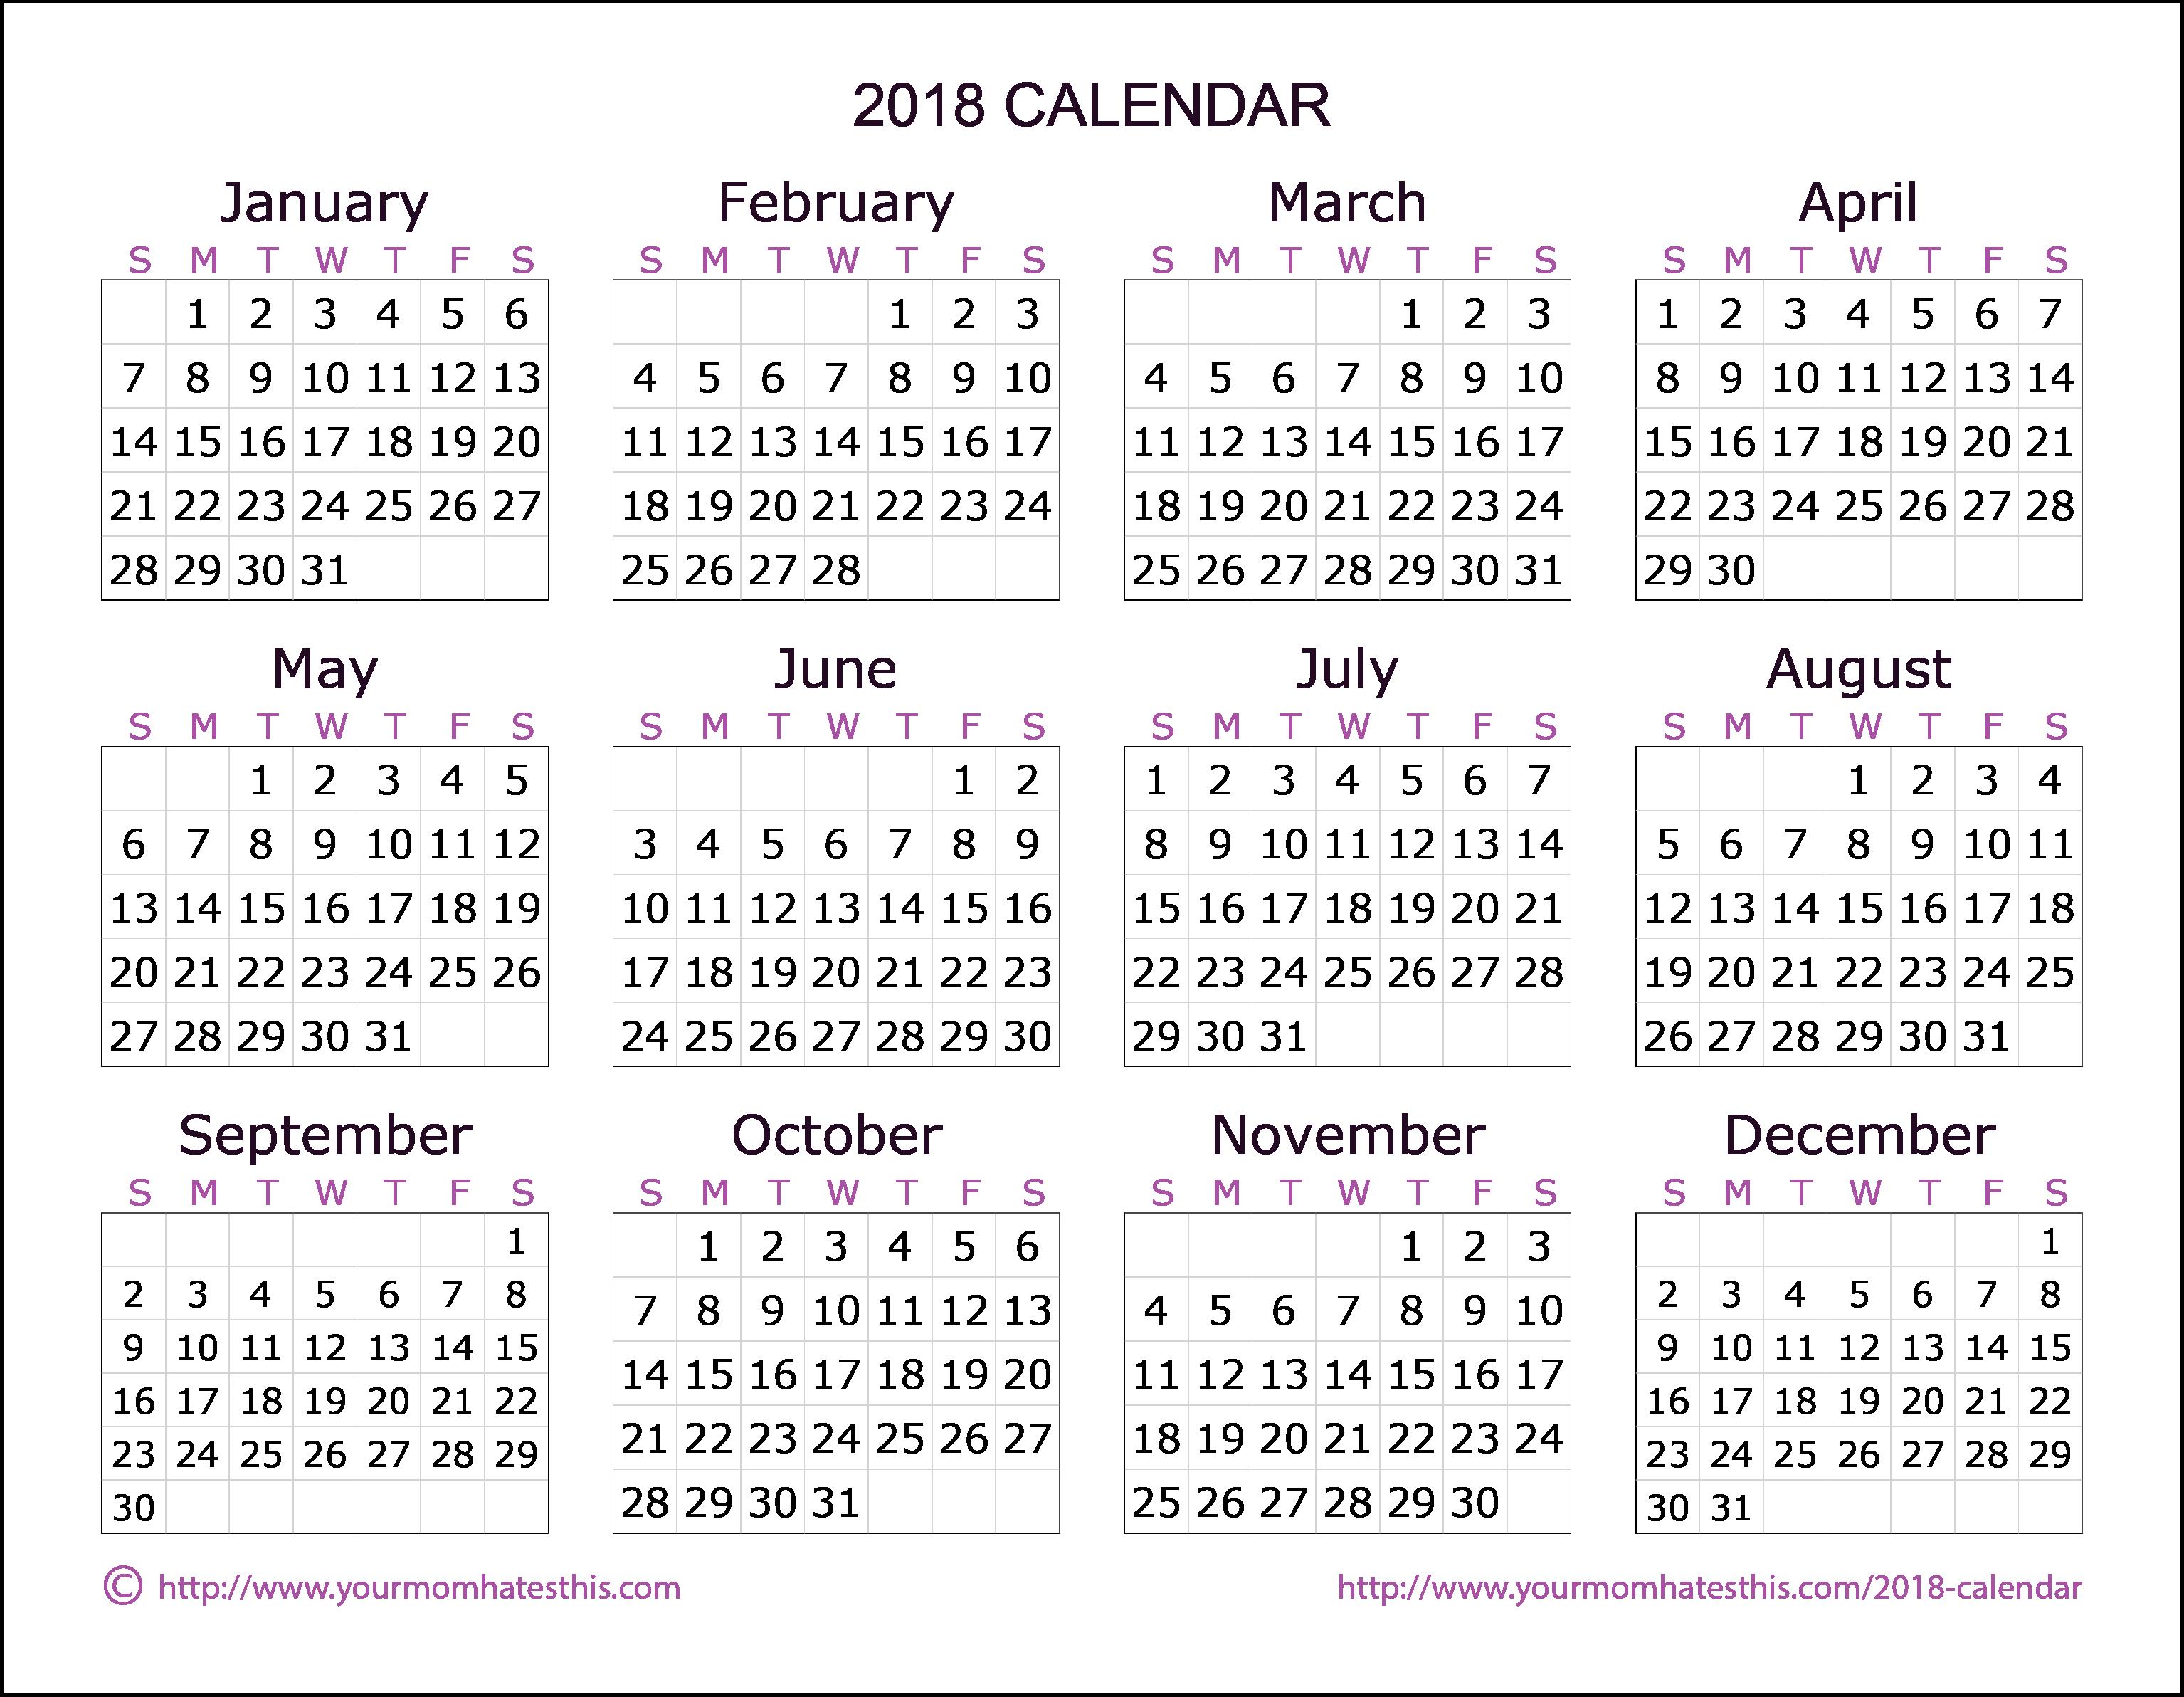 November 2015 calendar clipart transparent 2015 Calendar Overview of Features transparent